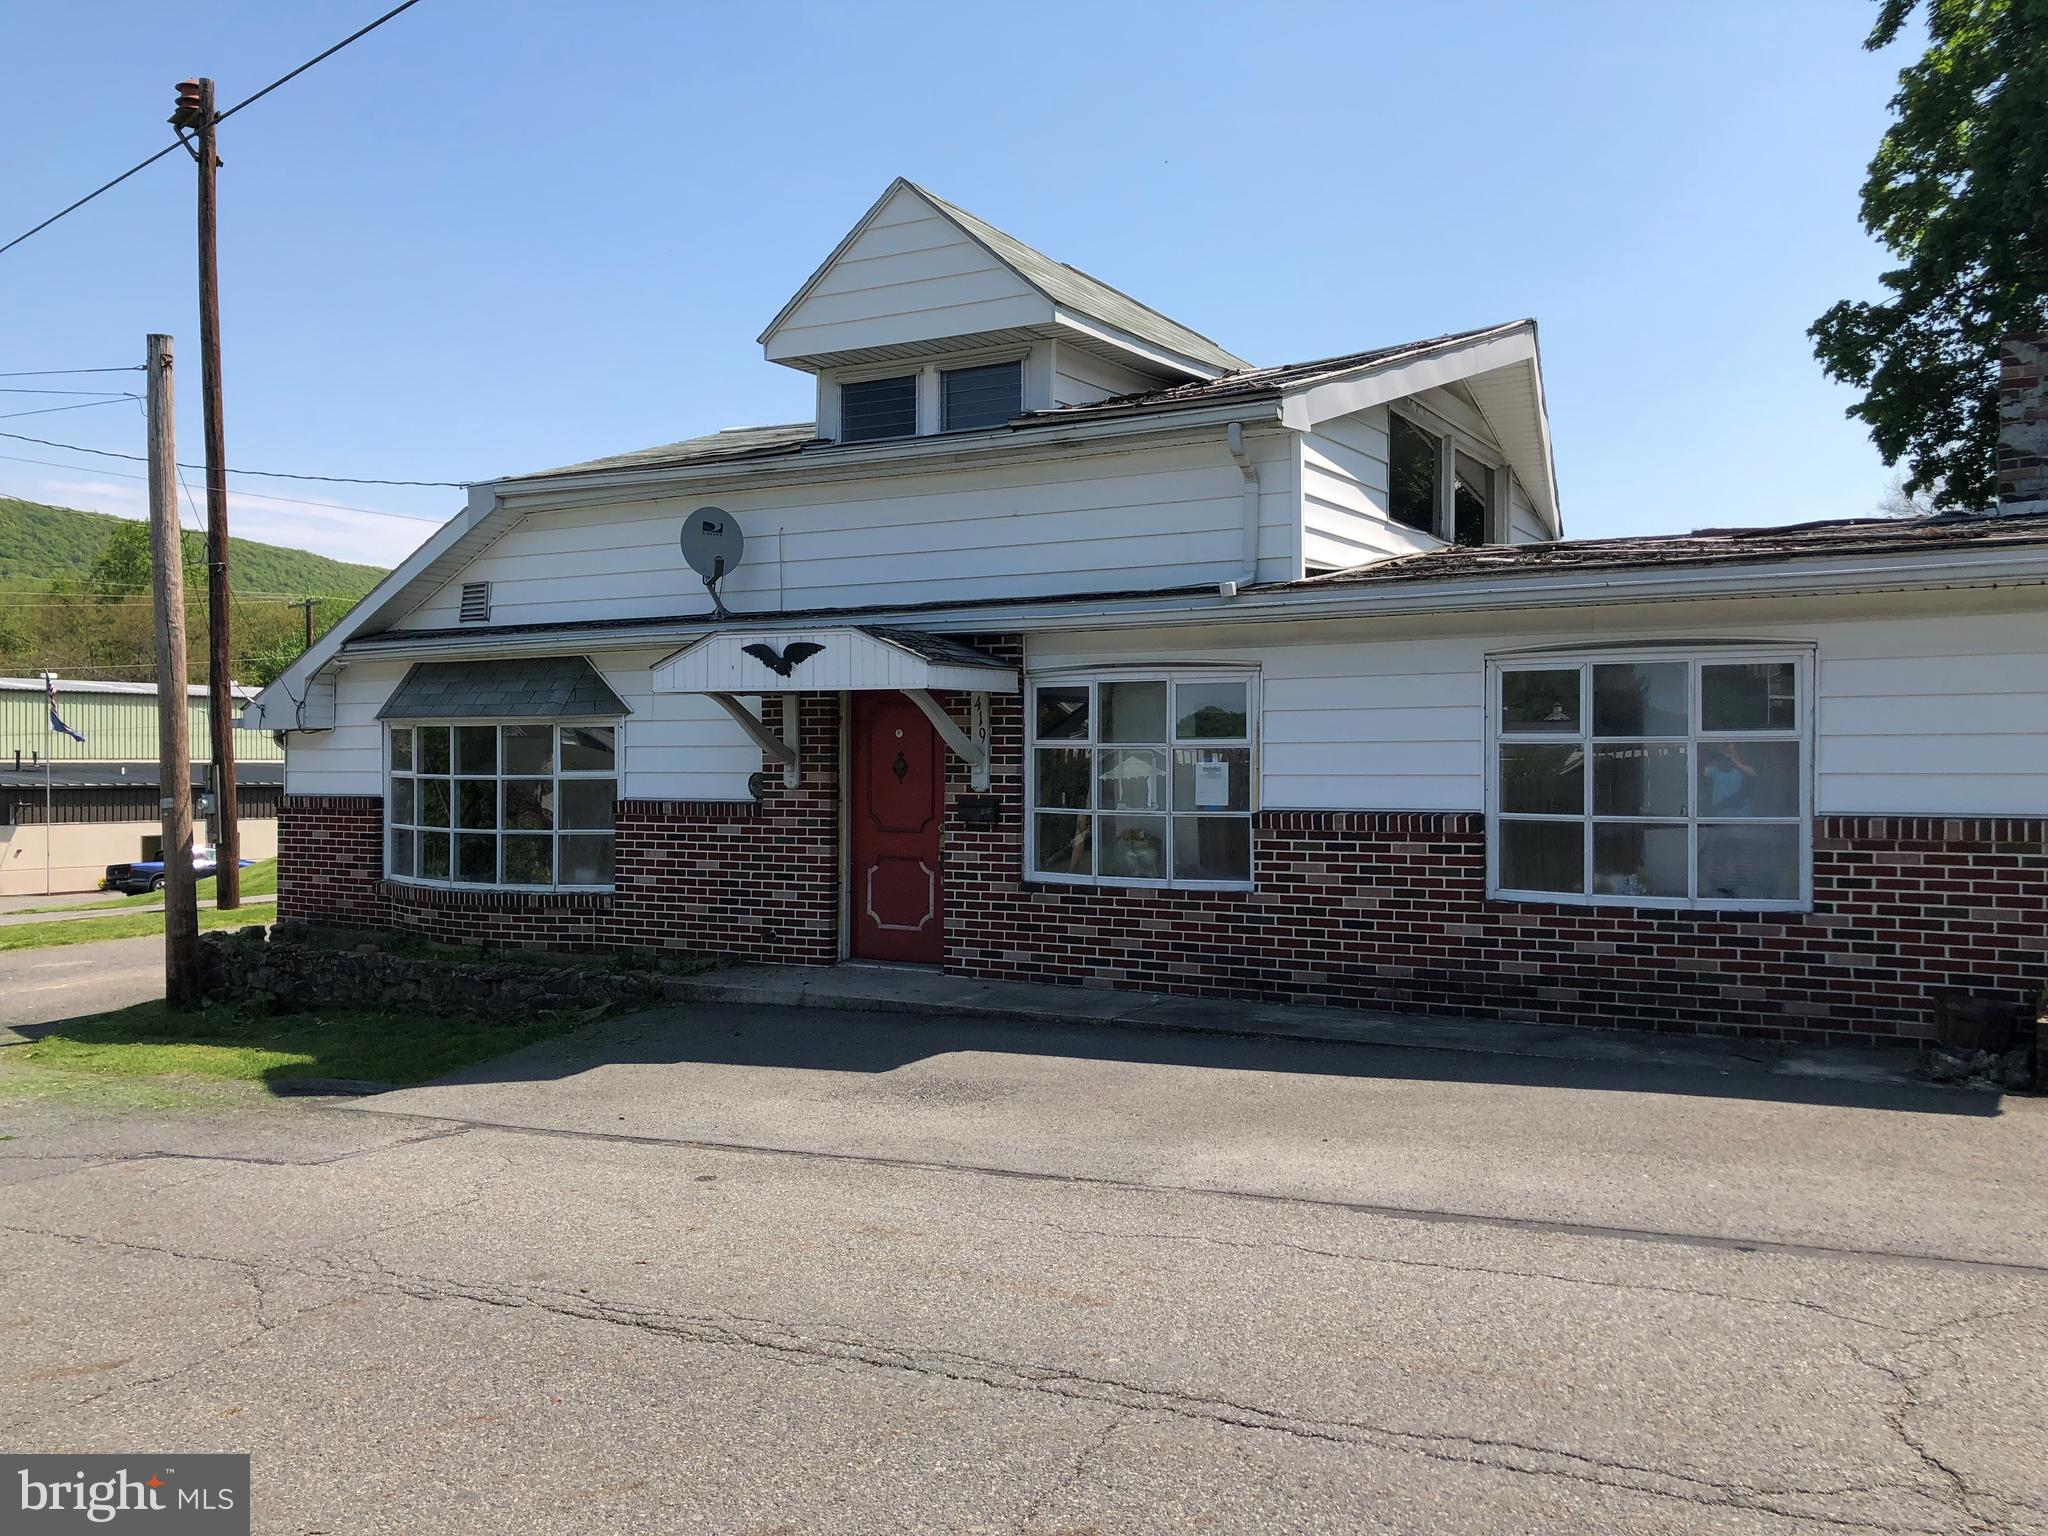 419 CHESTNUT STREET, LYKENS, PA 17048